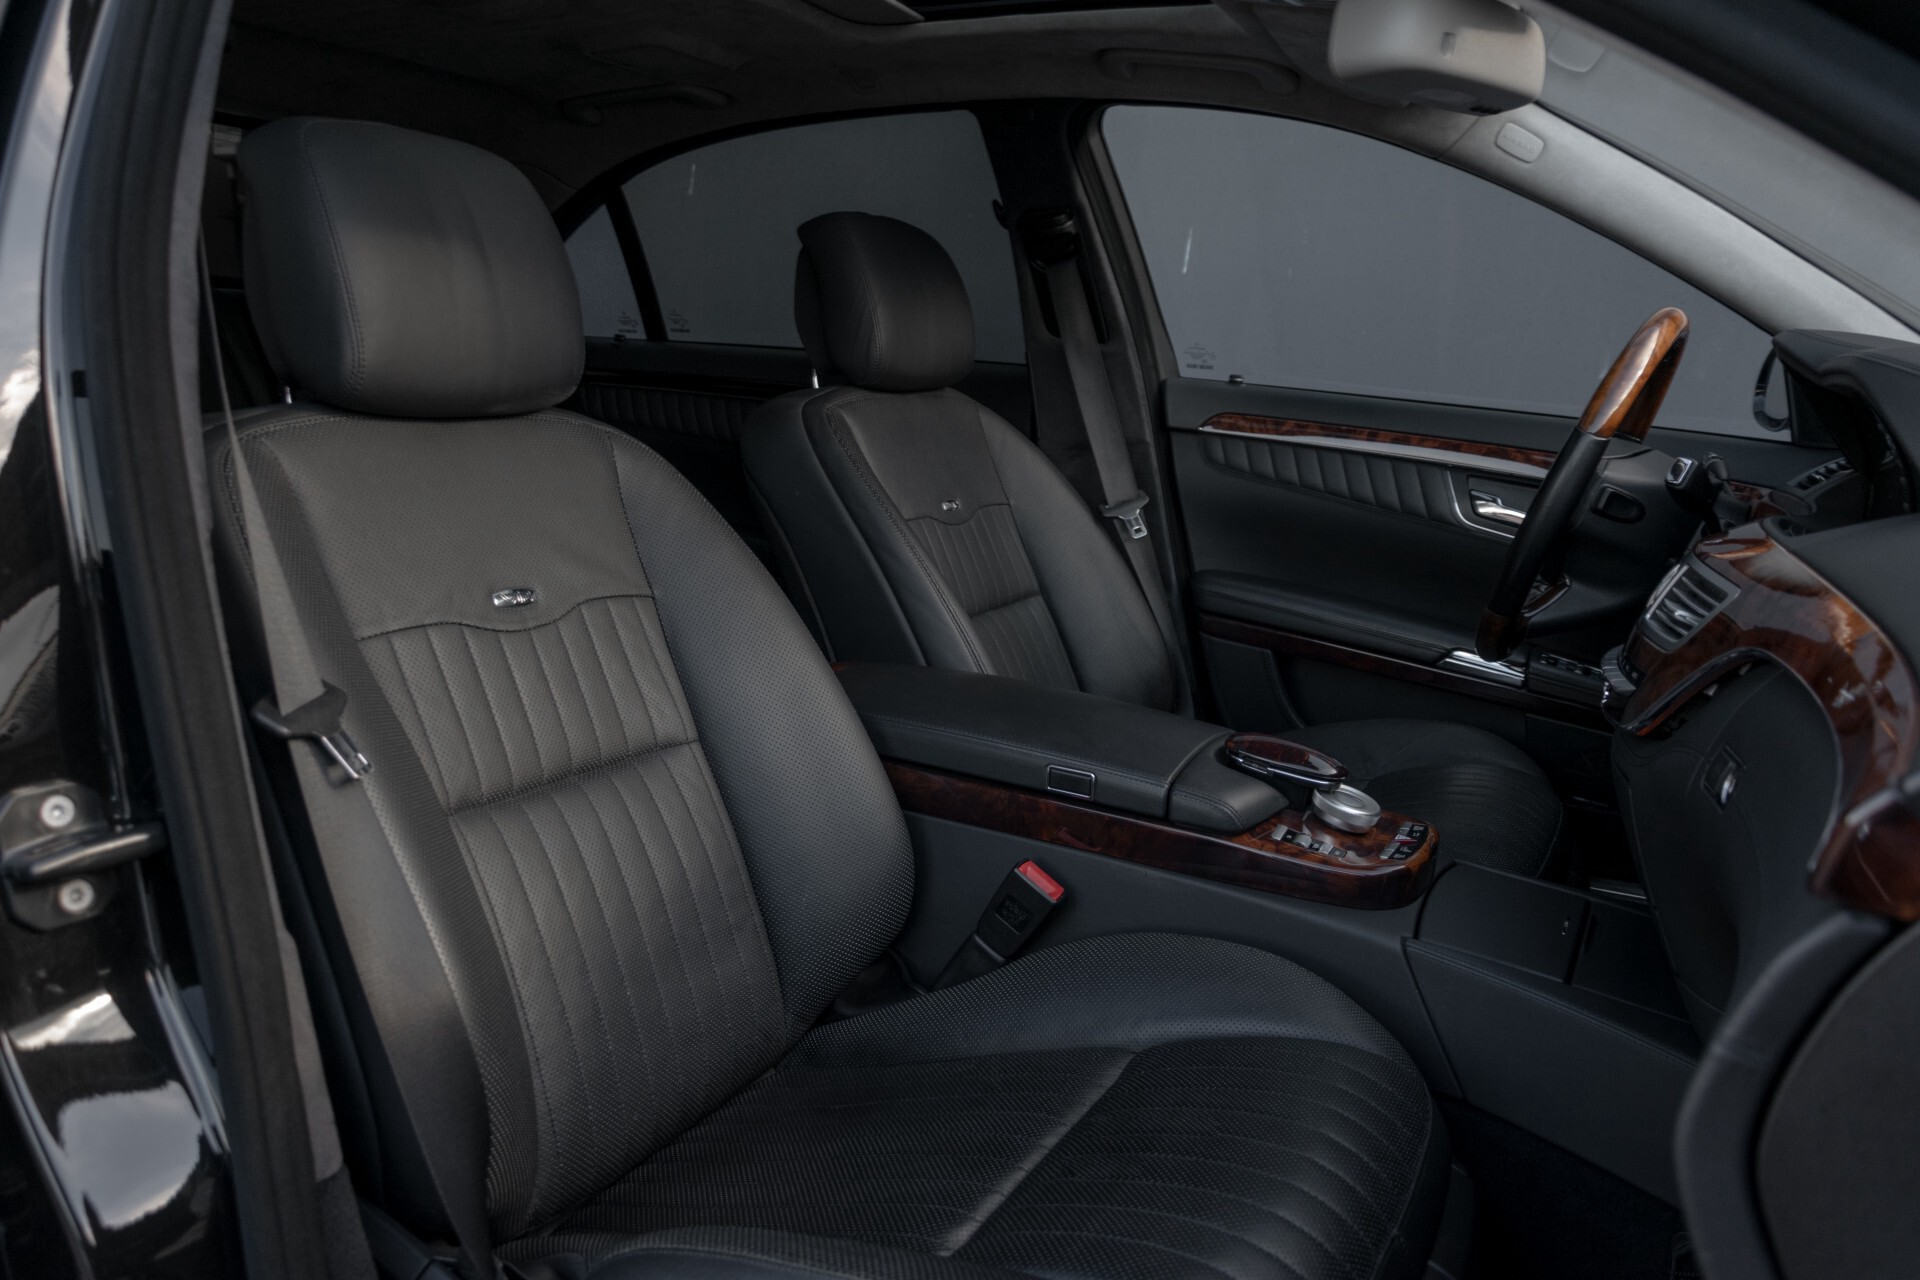 Mercedes-Benz S-Klasse 600 Lang 65 AMG Bi-Turbo Prestige Plus Aut5 Foto 4